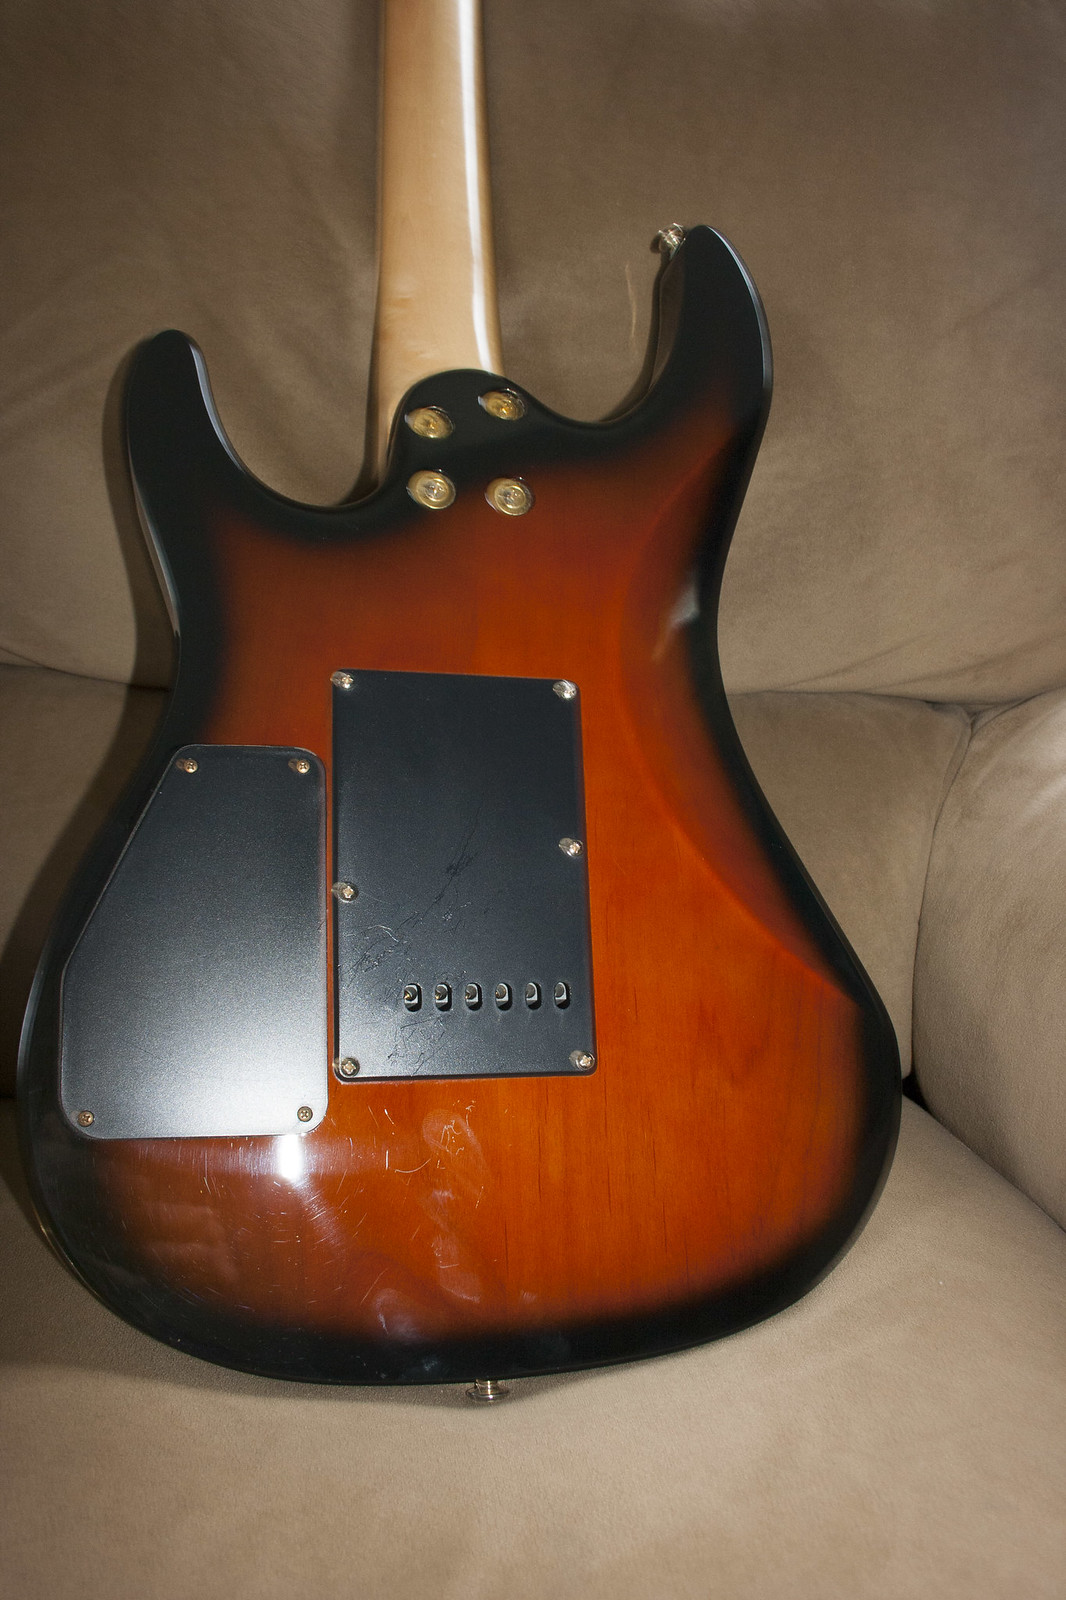 wtt ia beautiful aria mac 60 magna for acoustic electric ultimate guitar. Black Bedroom Furniture Sets. Home Design Ideas